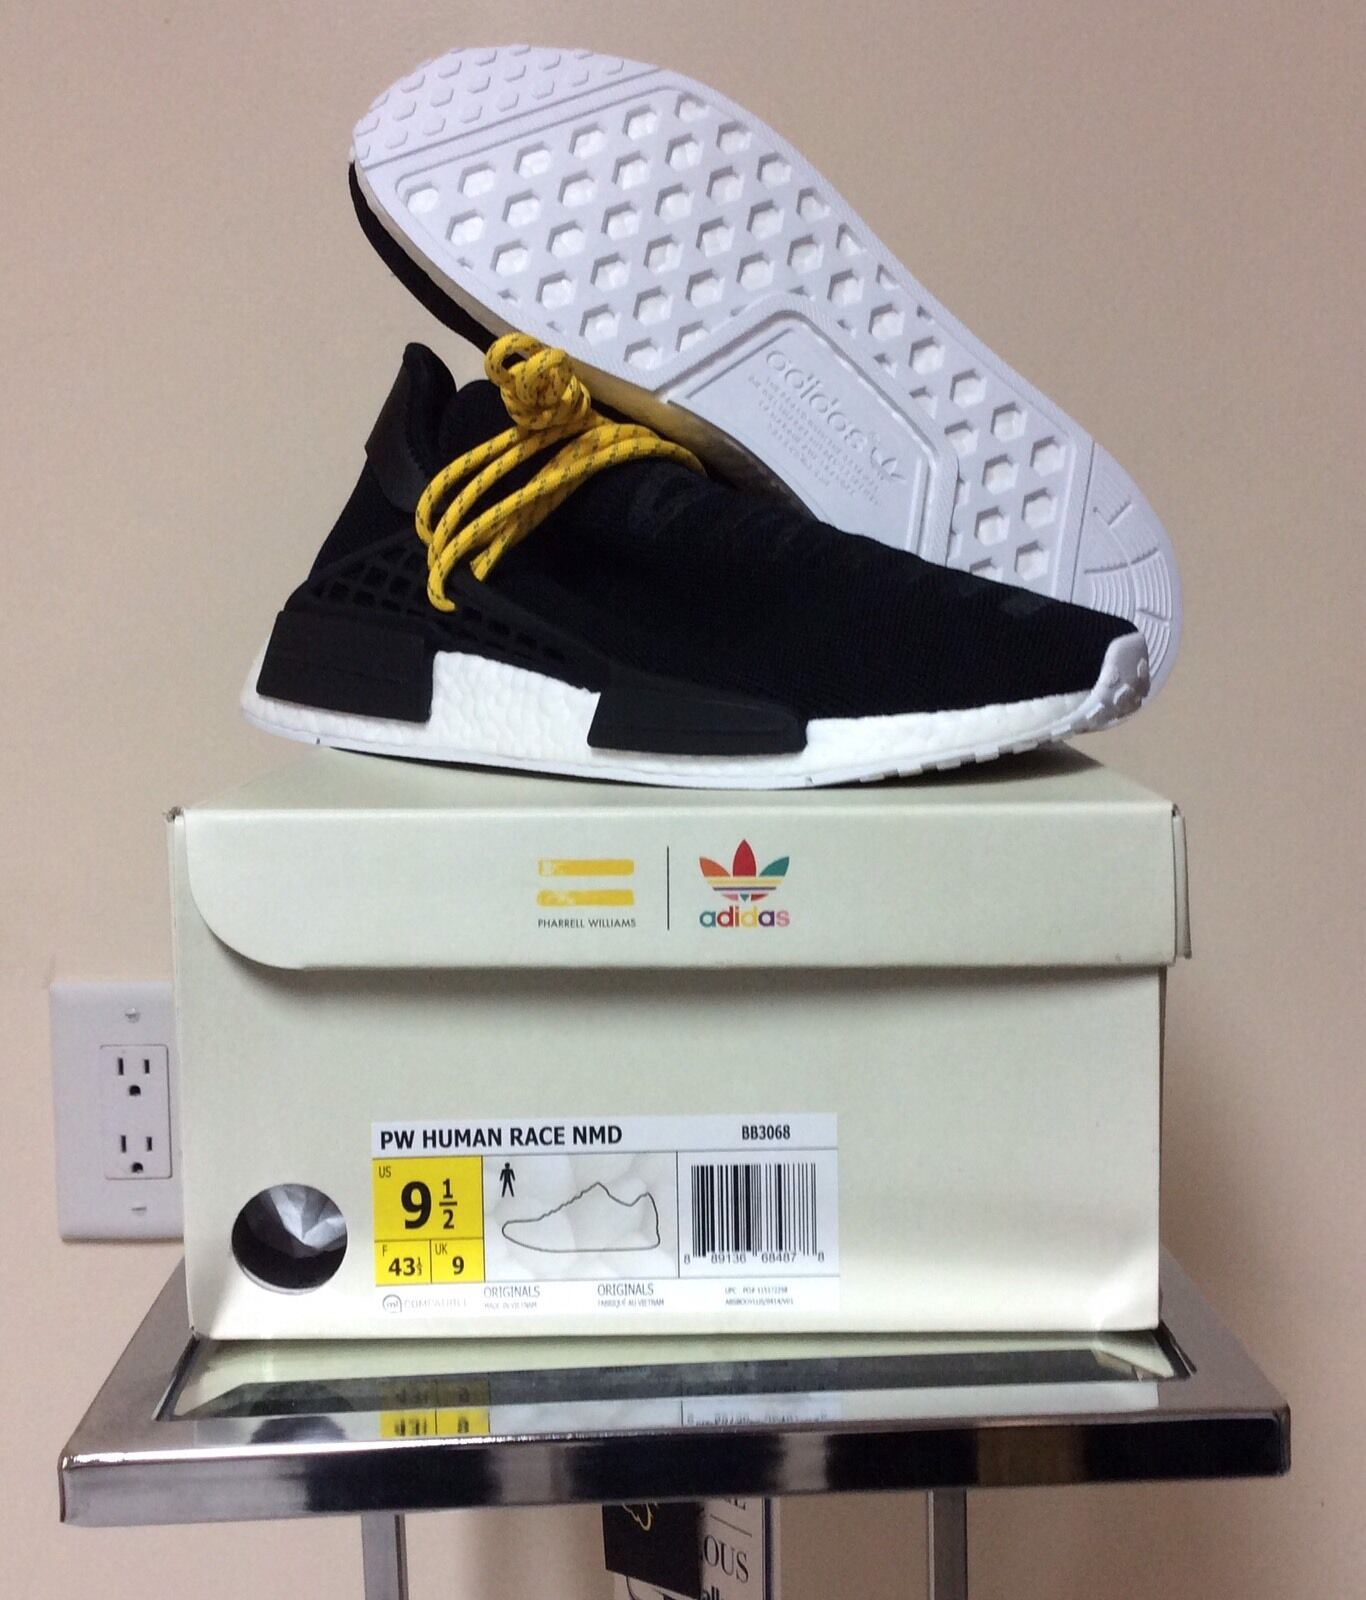 Adidas nero nmd hu bb3068 razza umana pharrell williams, nero Adidas e giallo specie umana 4c2a75